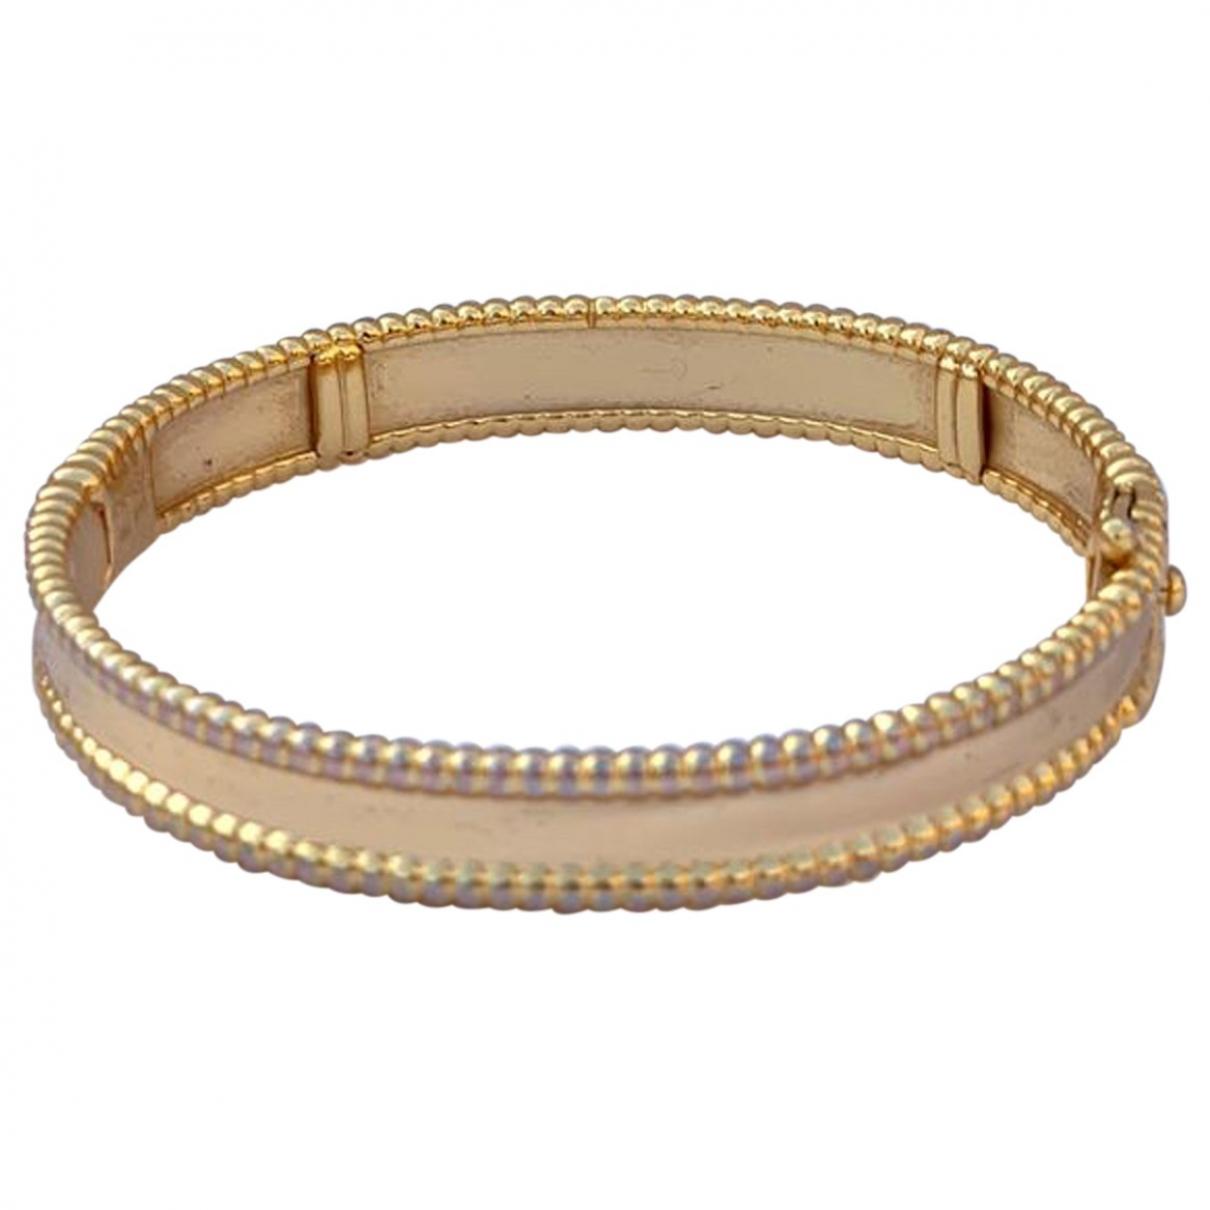 Van Cleef & Arpels - Bracelet Perlee  pour femme en or jaune - jaune